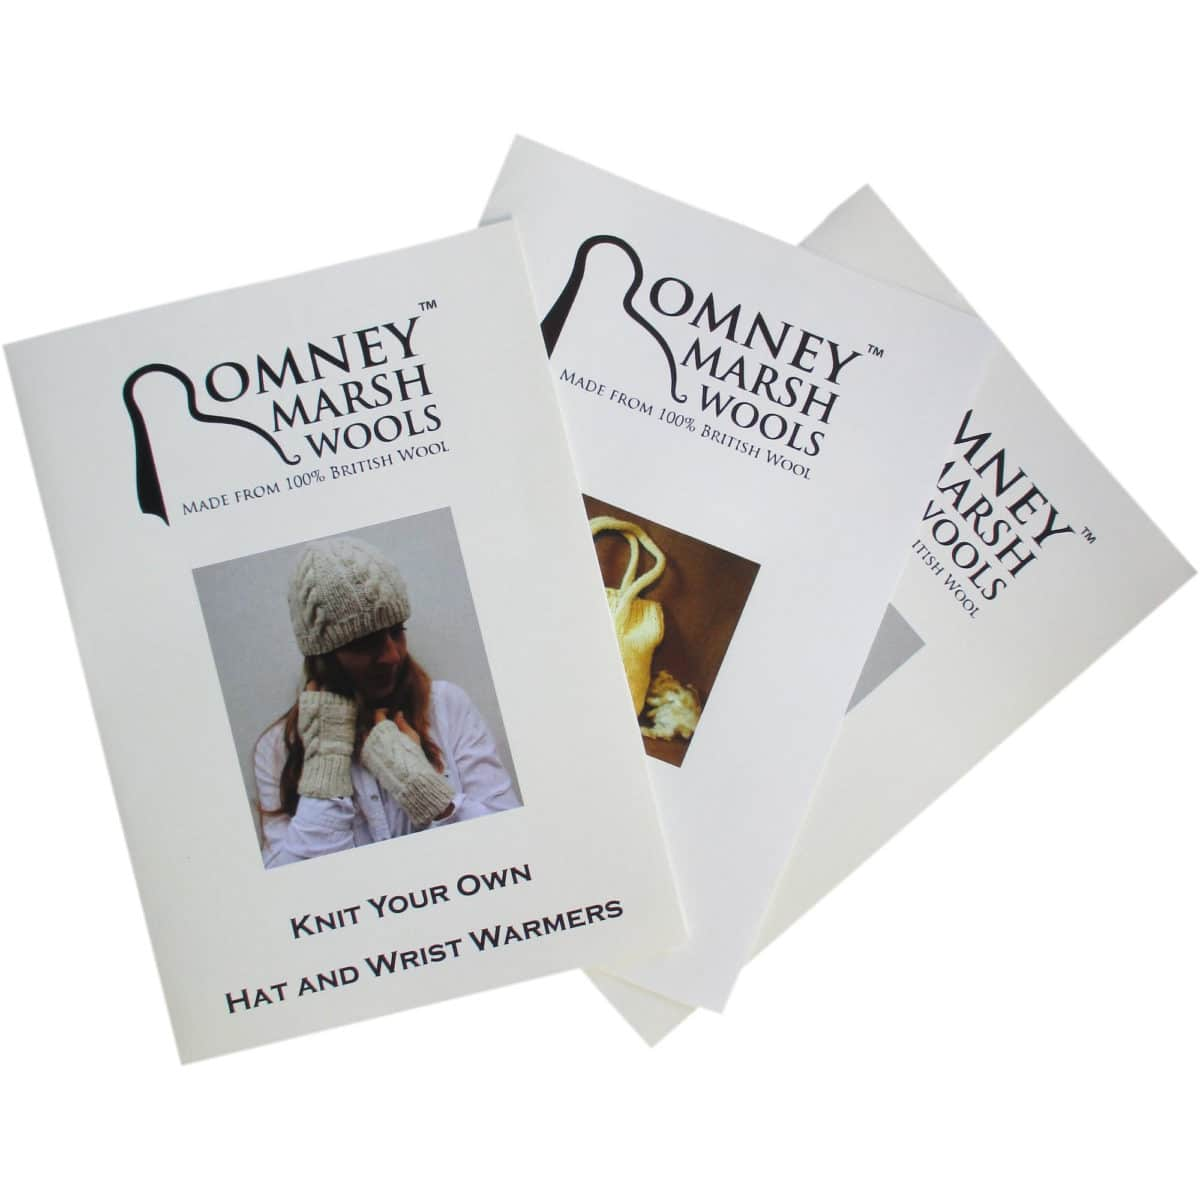 Romney Marsh Wool Knitting Patterns